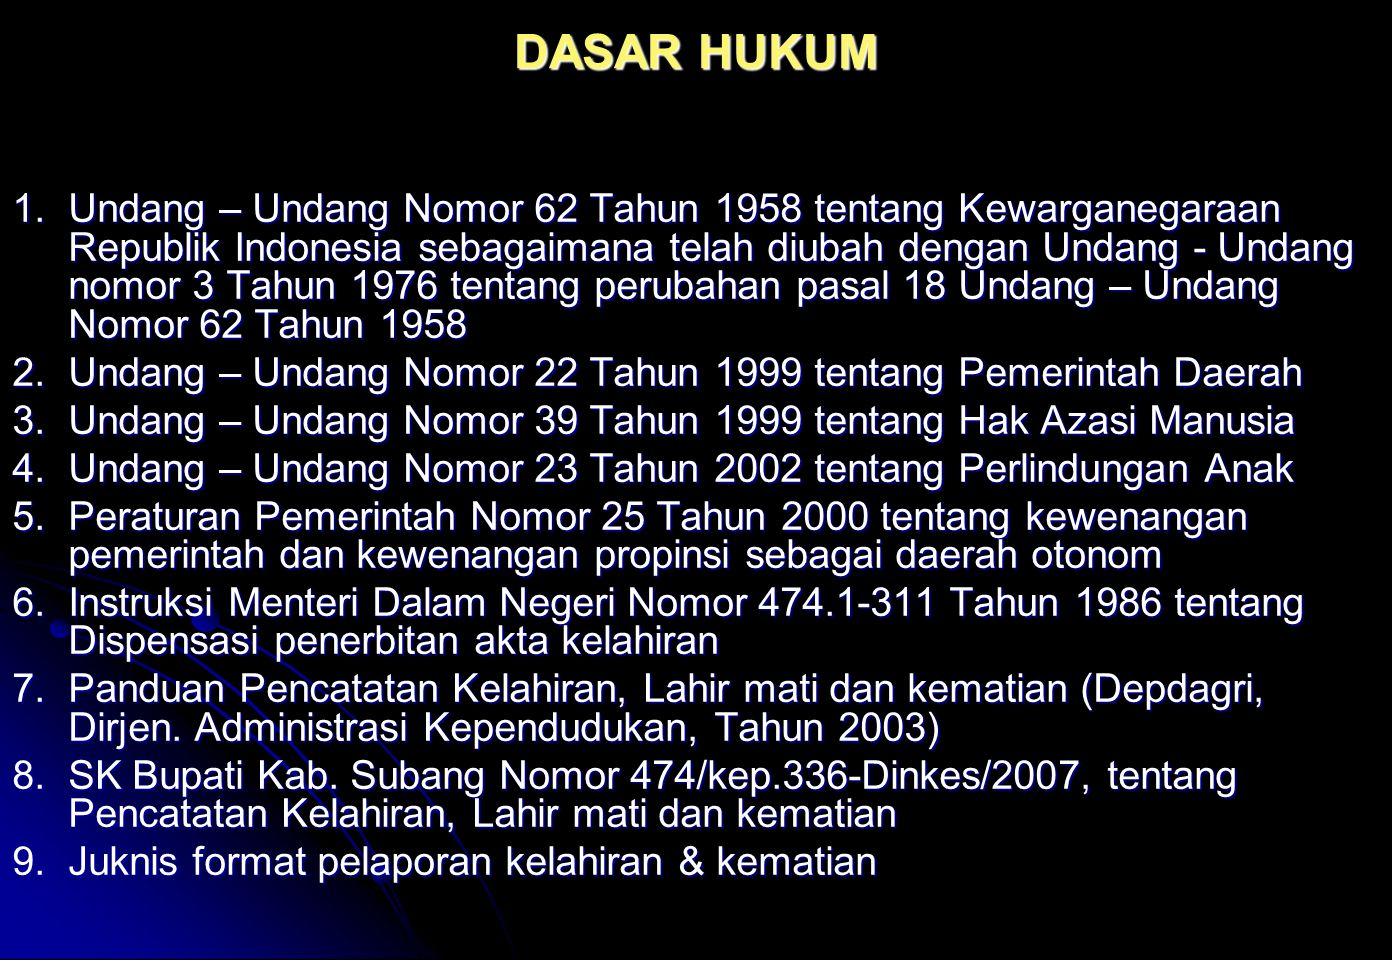 DASAR HUKUM 1.Undang – Undang Nomor 62 Tahun 1958 tentang Kewarganegaraan Republik Indonesia sebagaimana telah diubah dengan Undang - Undang nomor 3 T